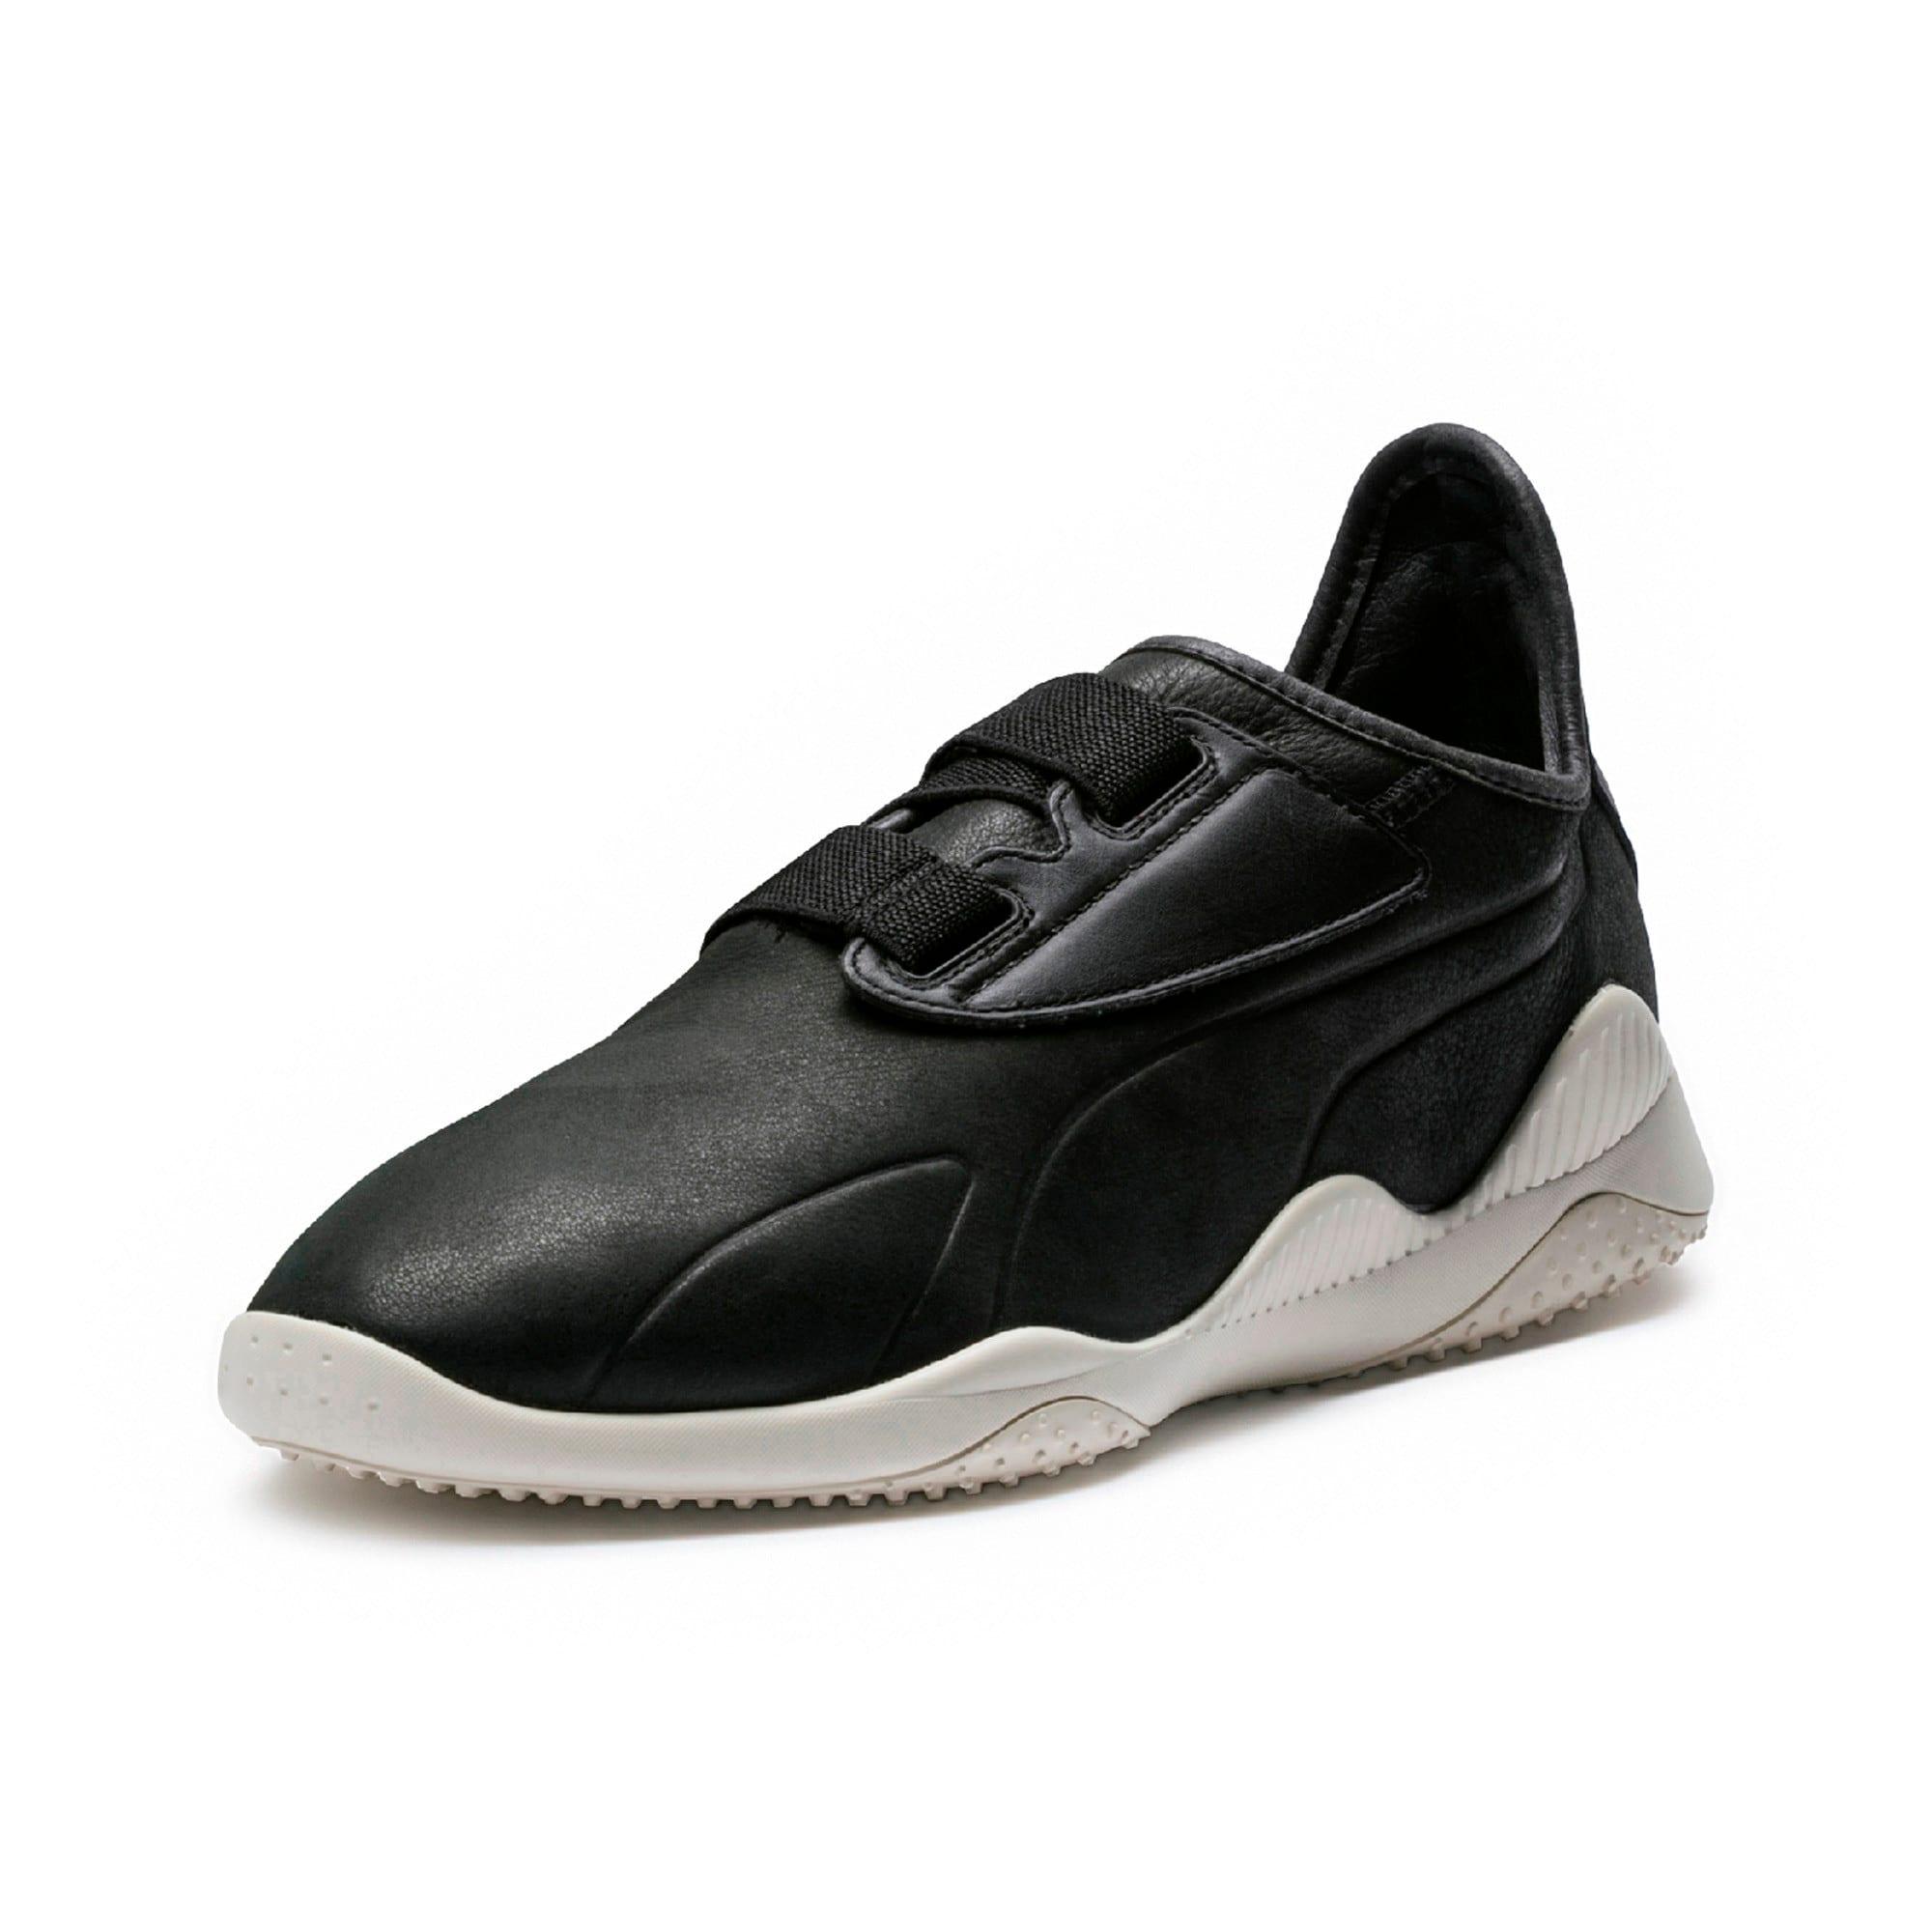 Thumbnail 1 of Mostro Premium, Puma Black-Whisper White, medium-IND